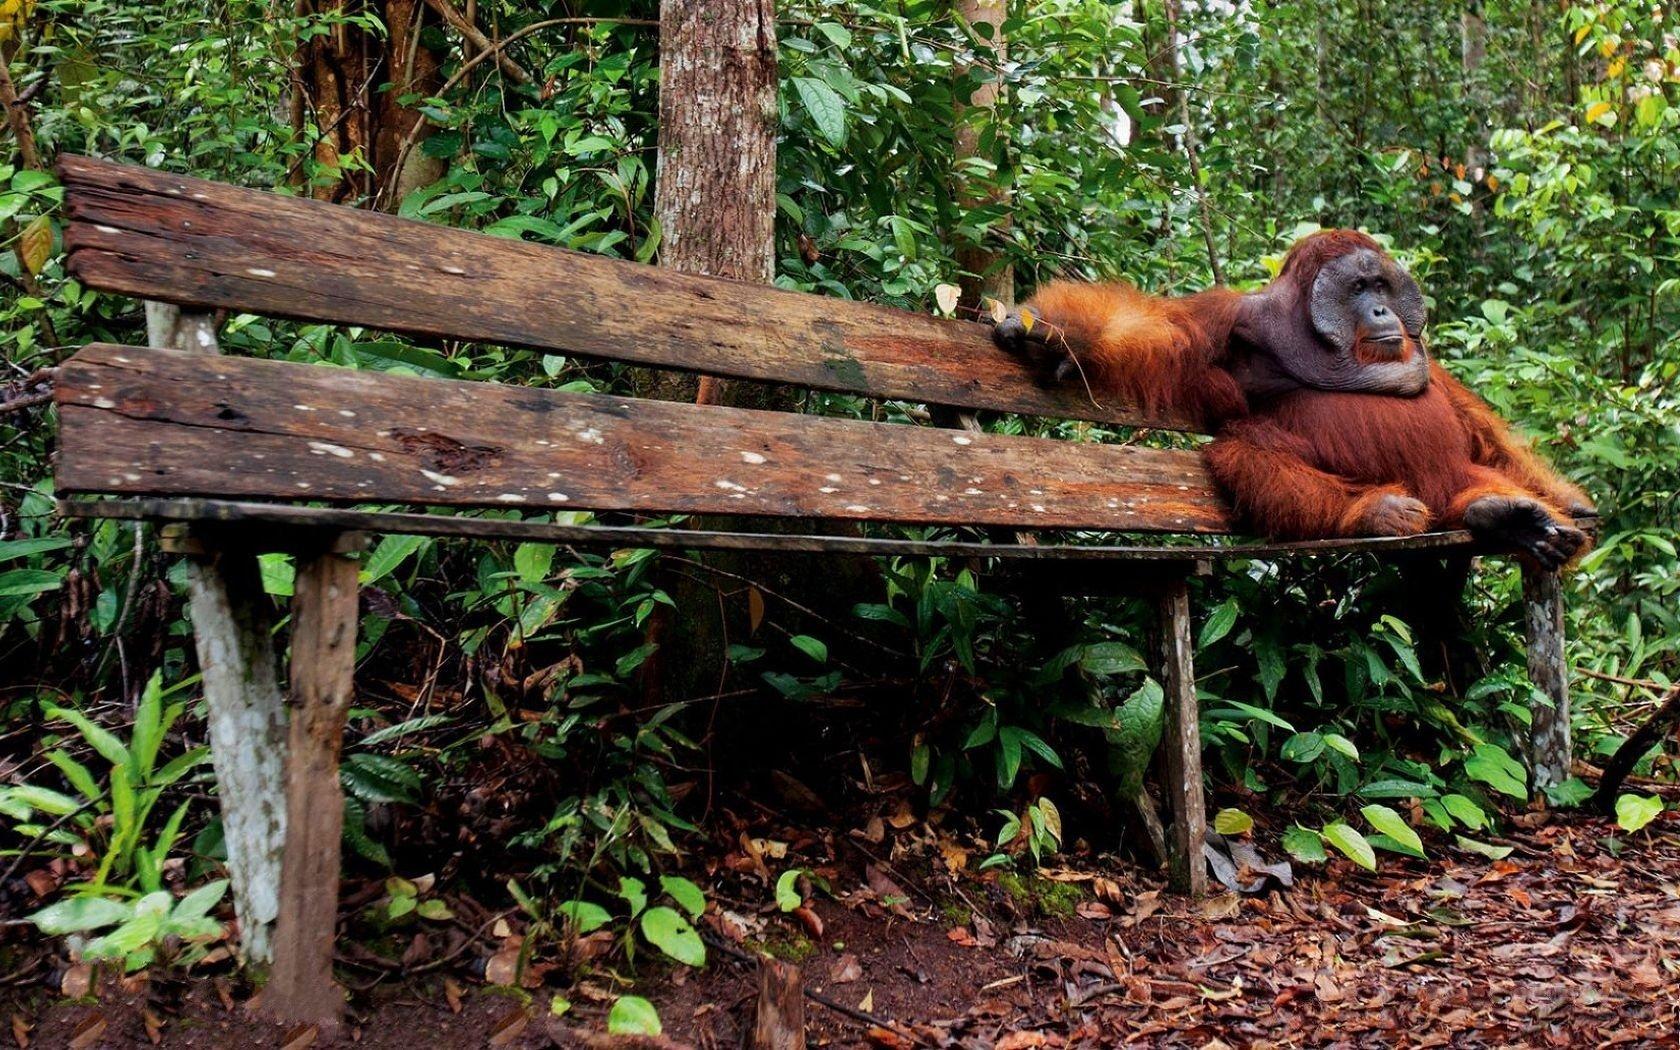 Orangutan Wallpaper And Background Image 1680x1050 Id332918